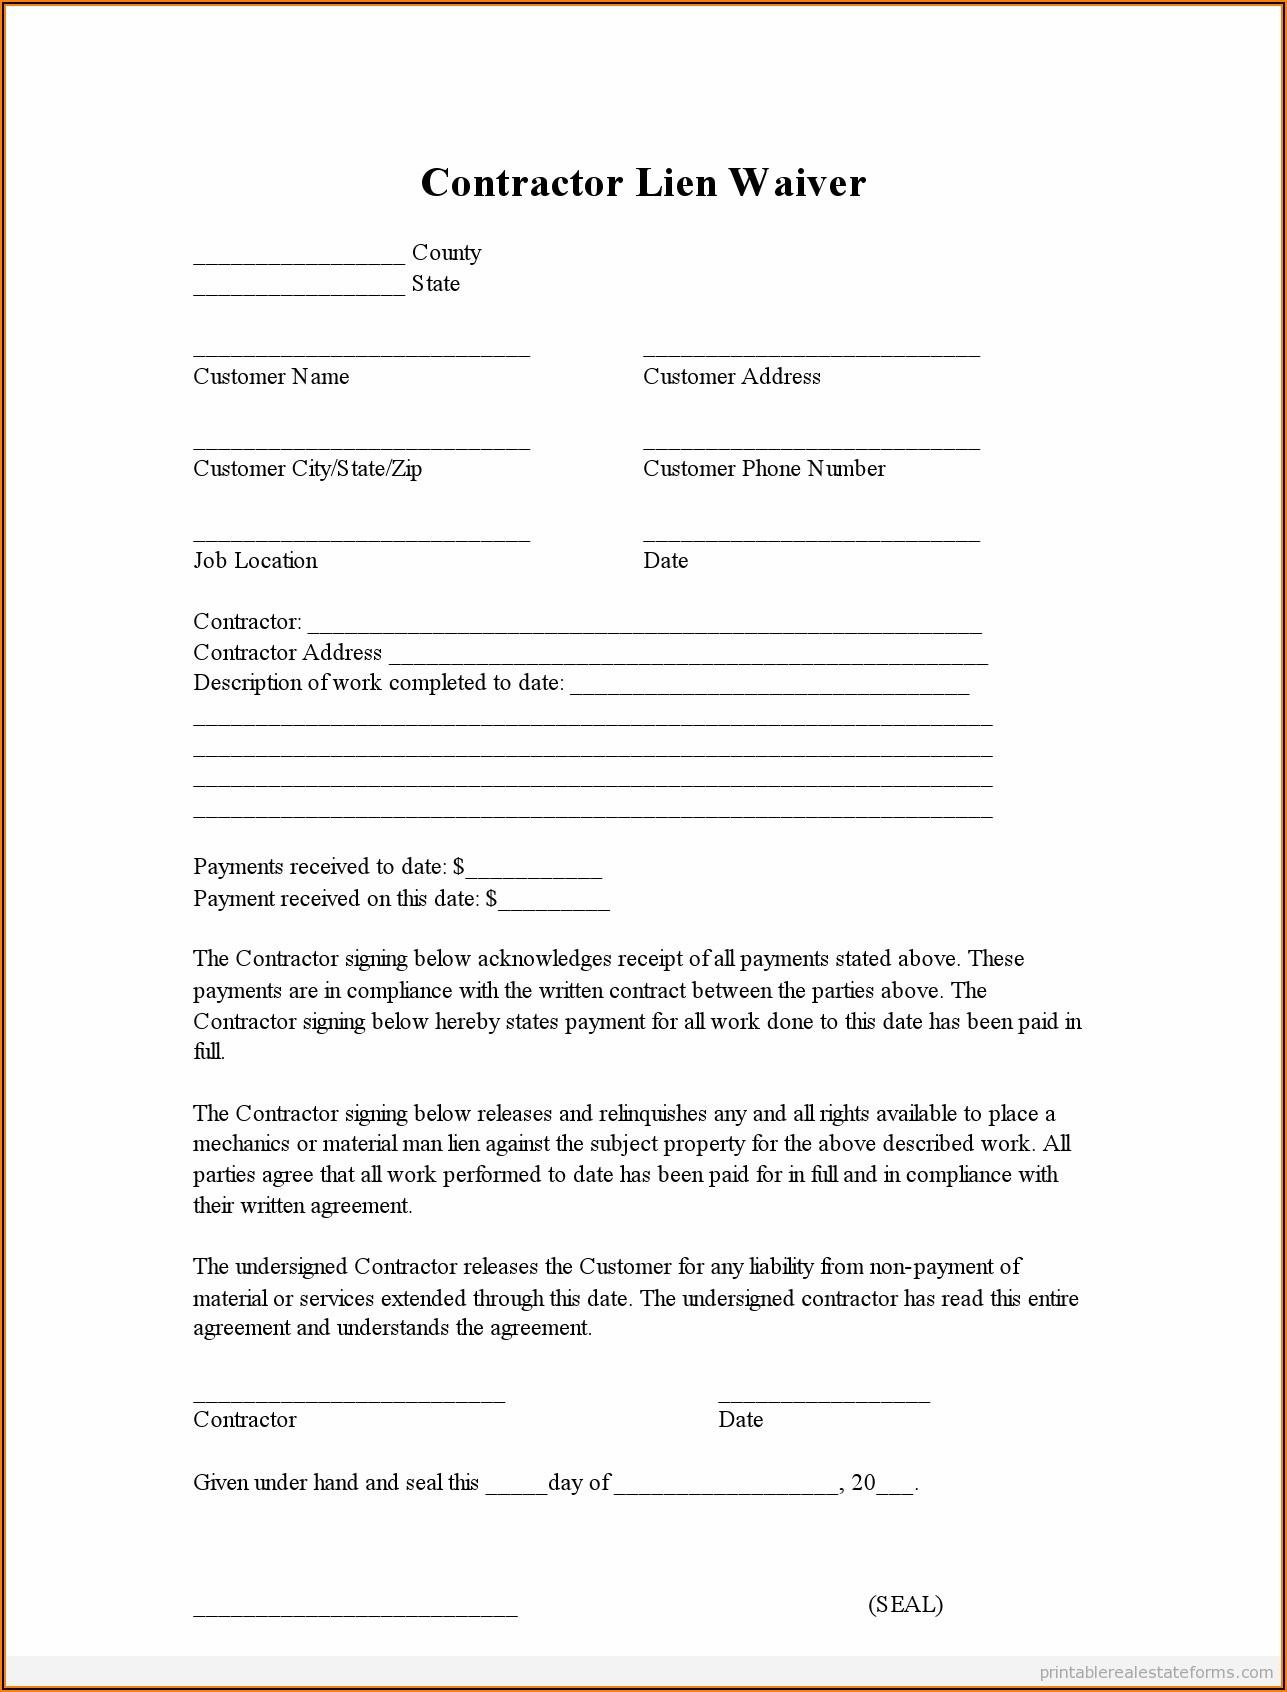 Standard Lien Waiver Form Free